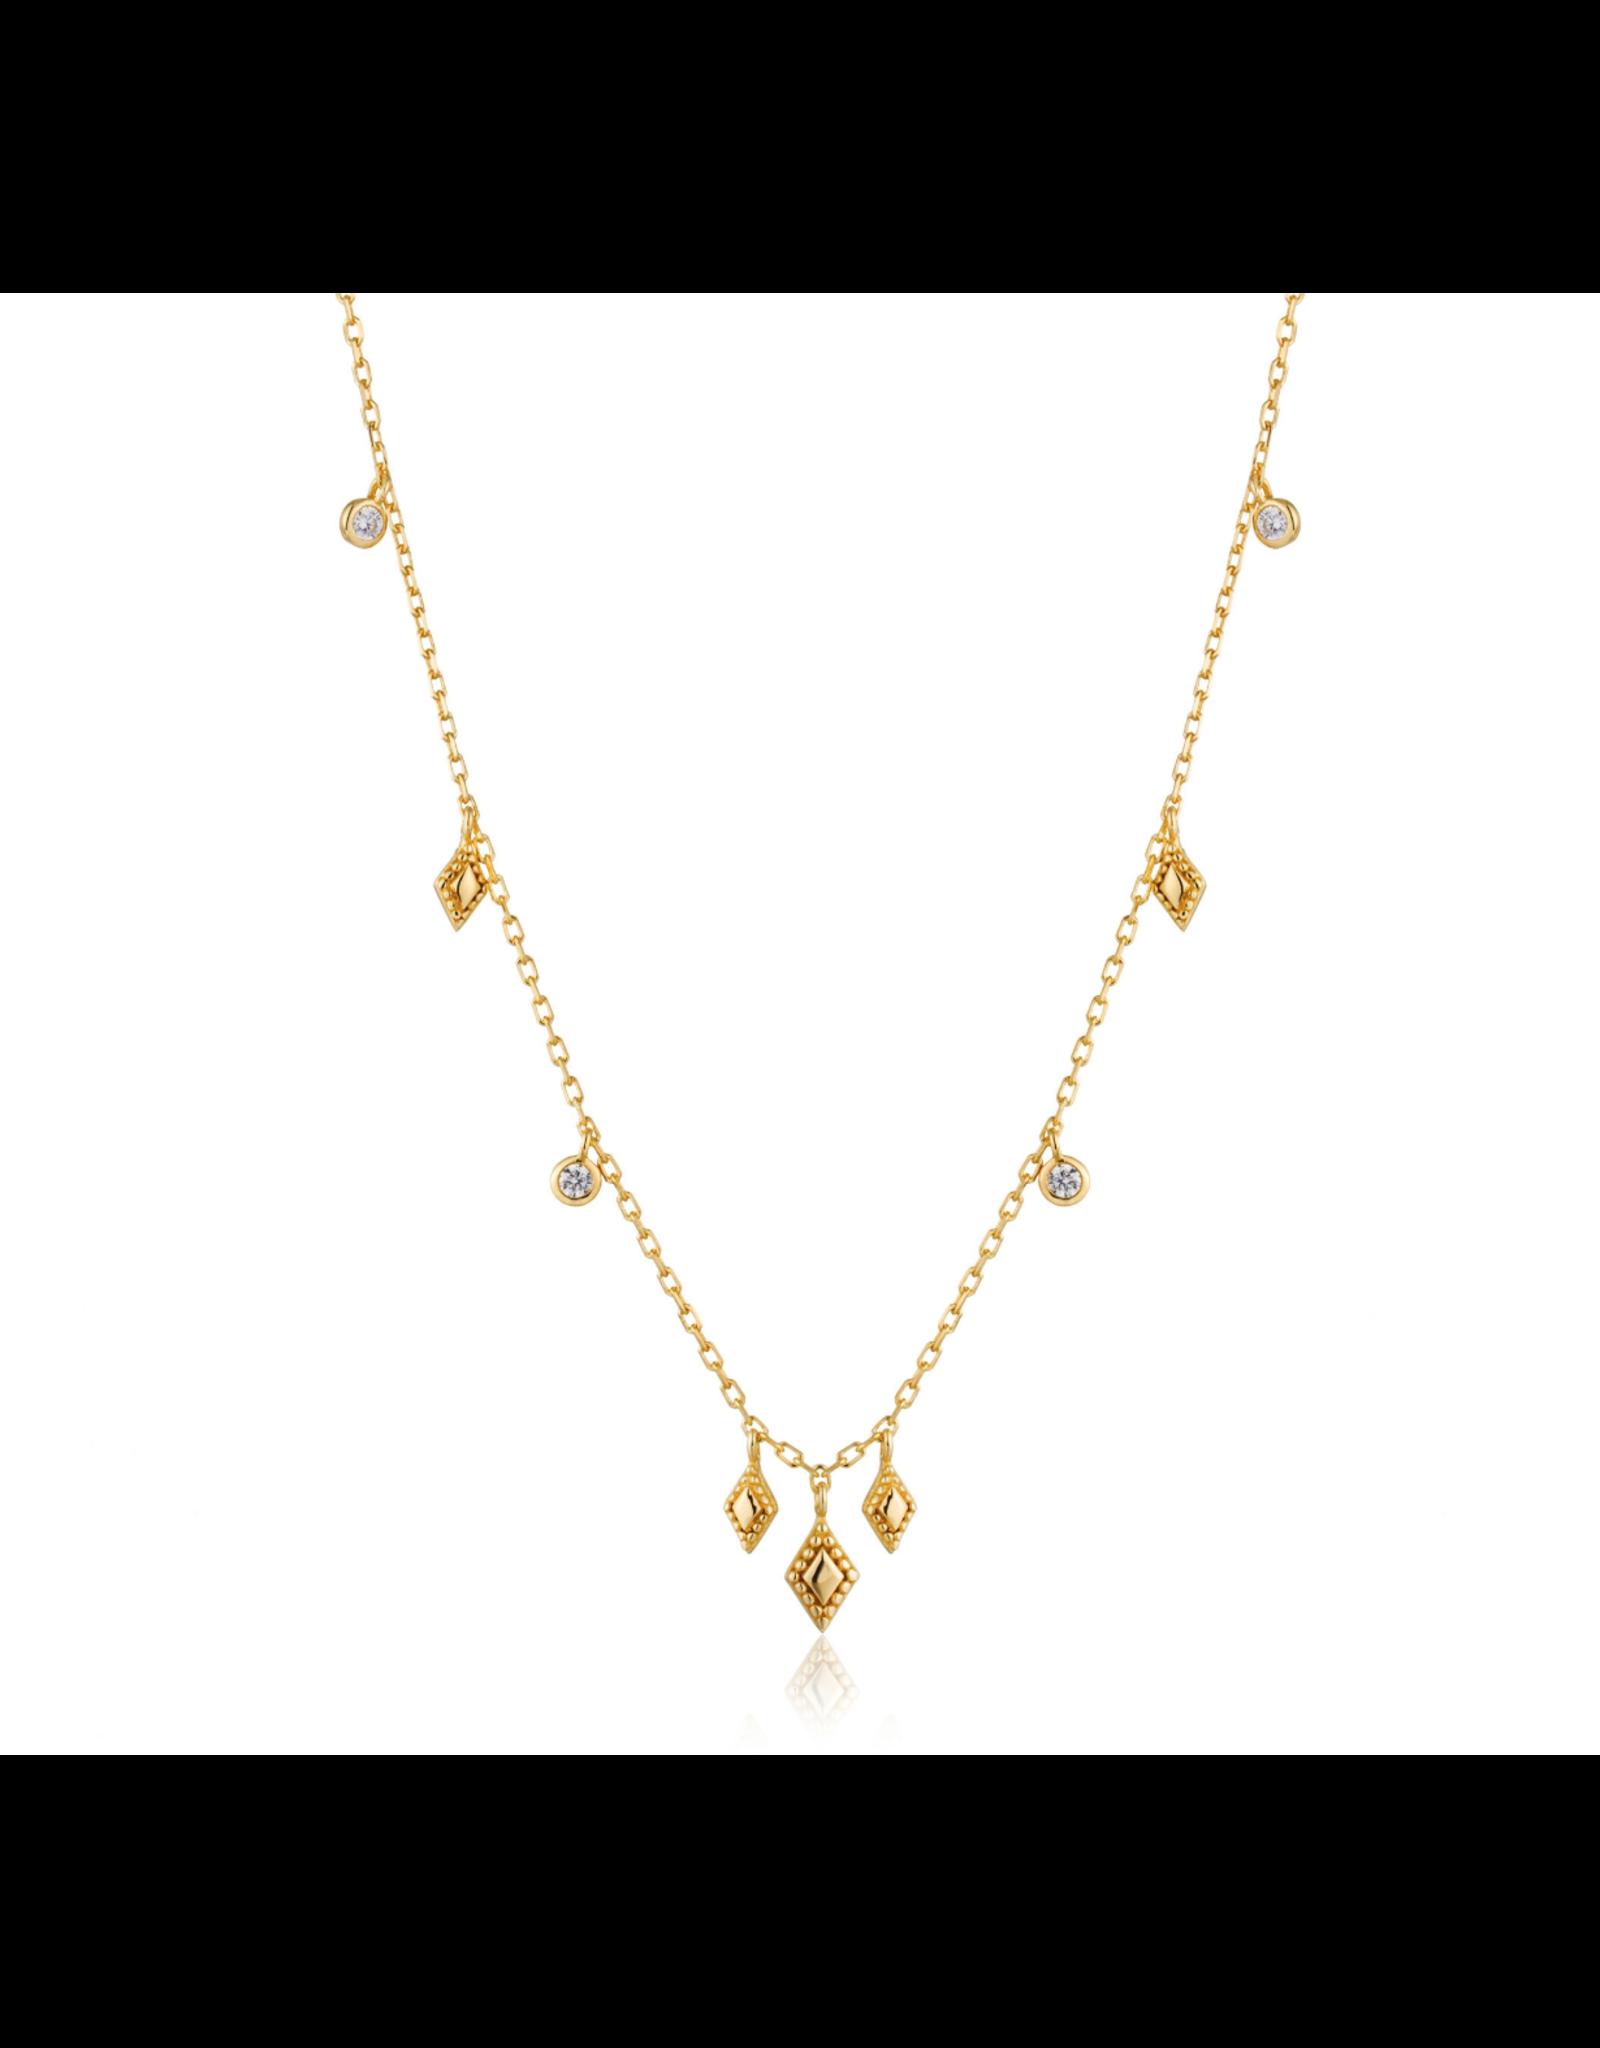 Ania Haie Bohemia Necklace, gold